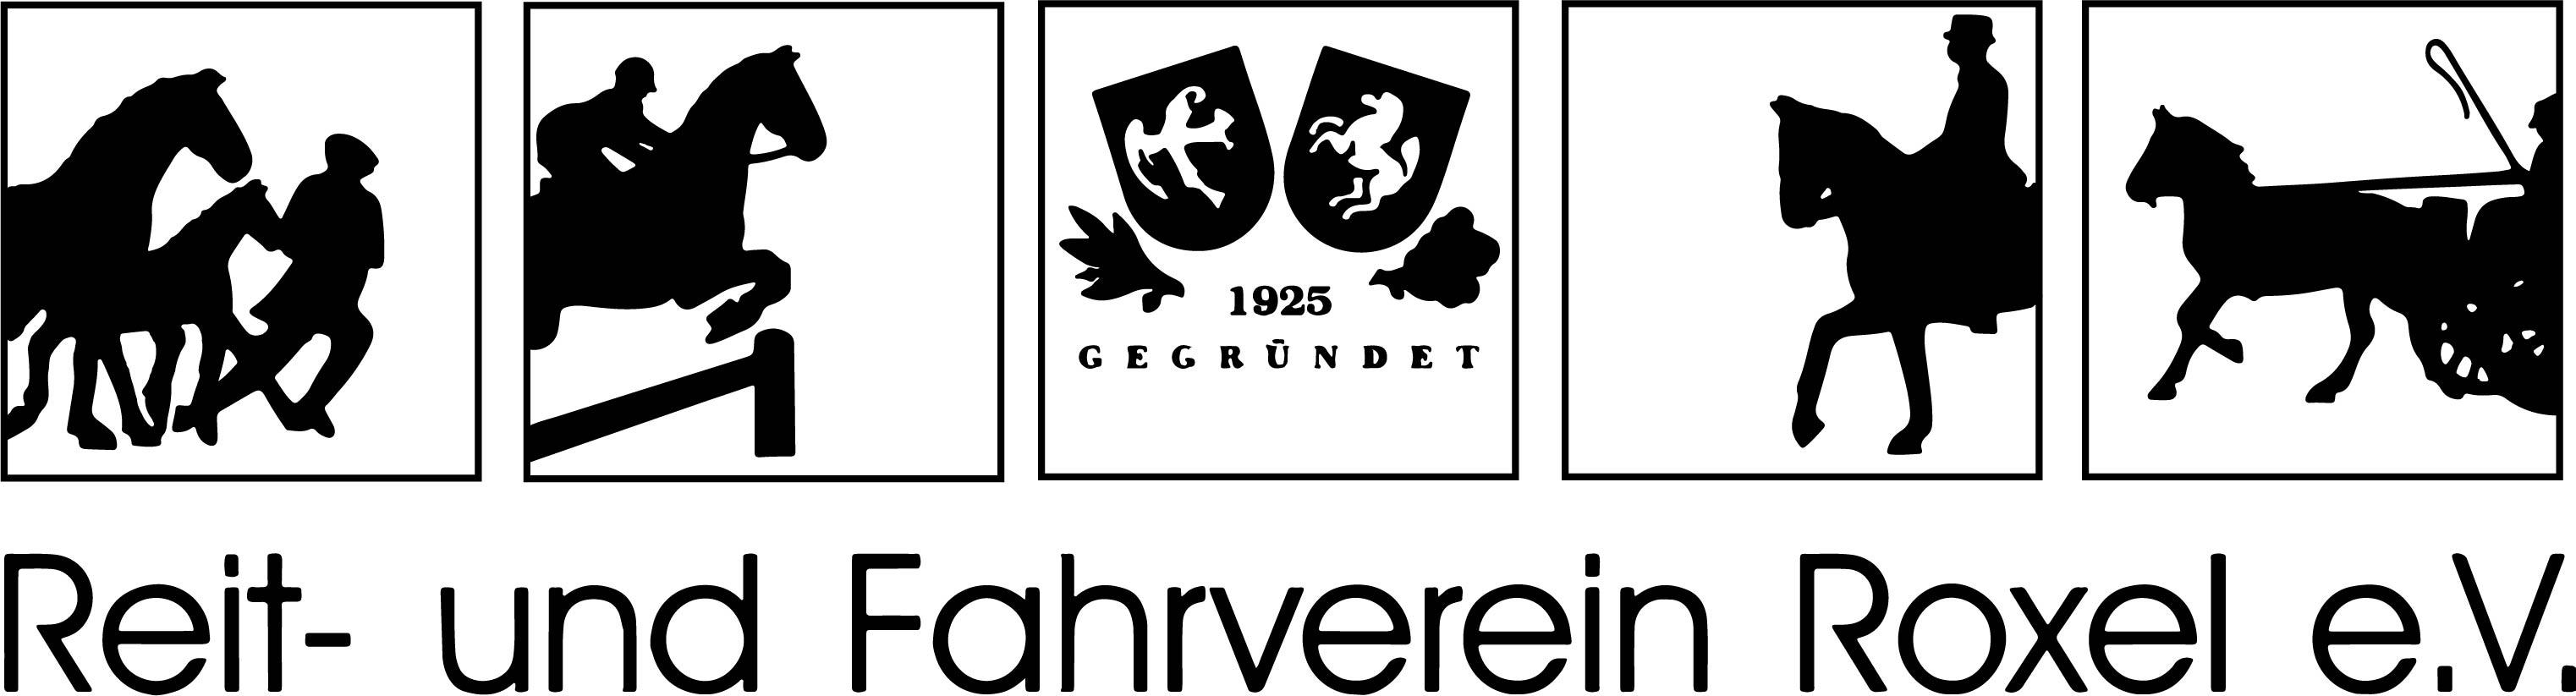 Reit- und Fahrverein Roxel e.V.